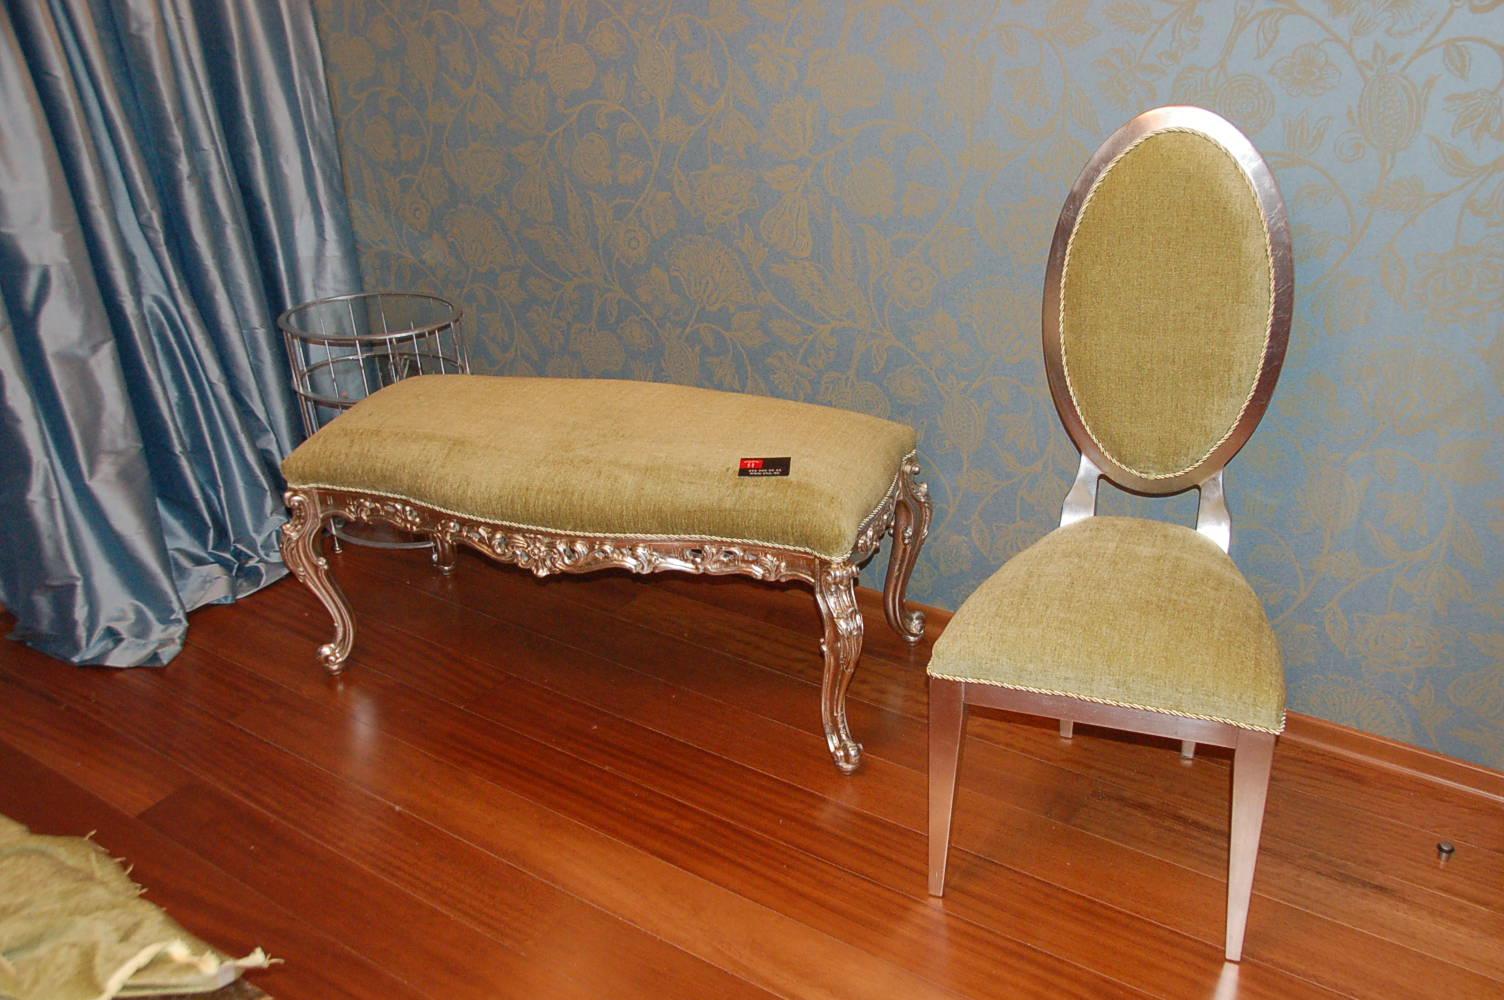 Upholstery- How to Diamond Tuft Мебель, Обивка и Мягкая 91